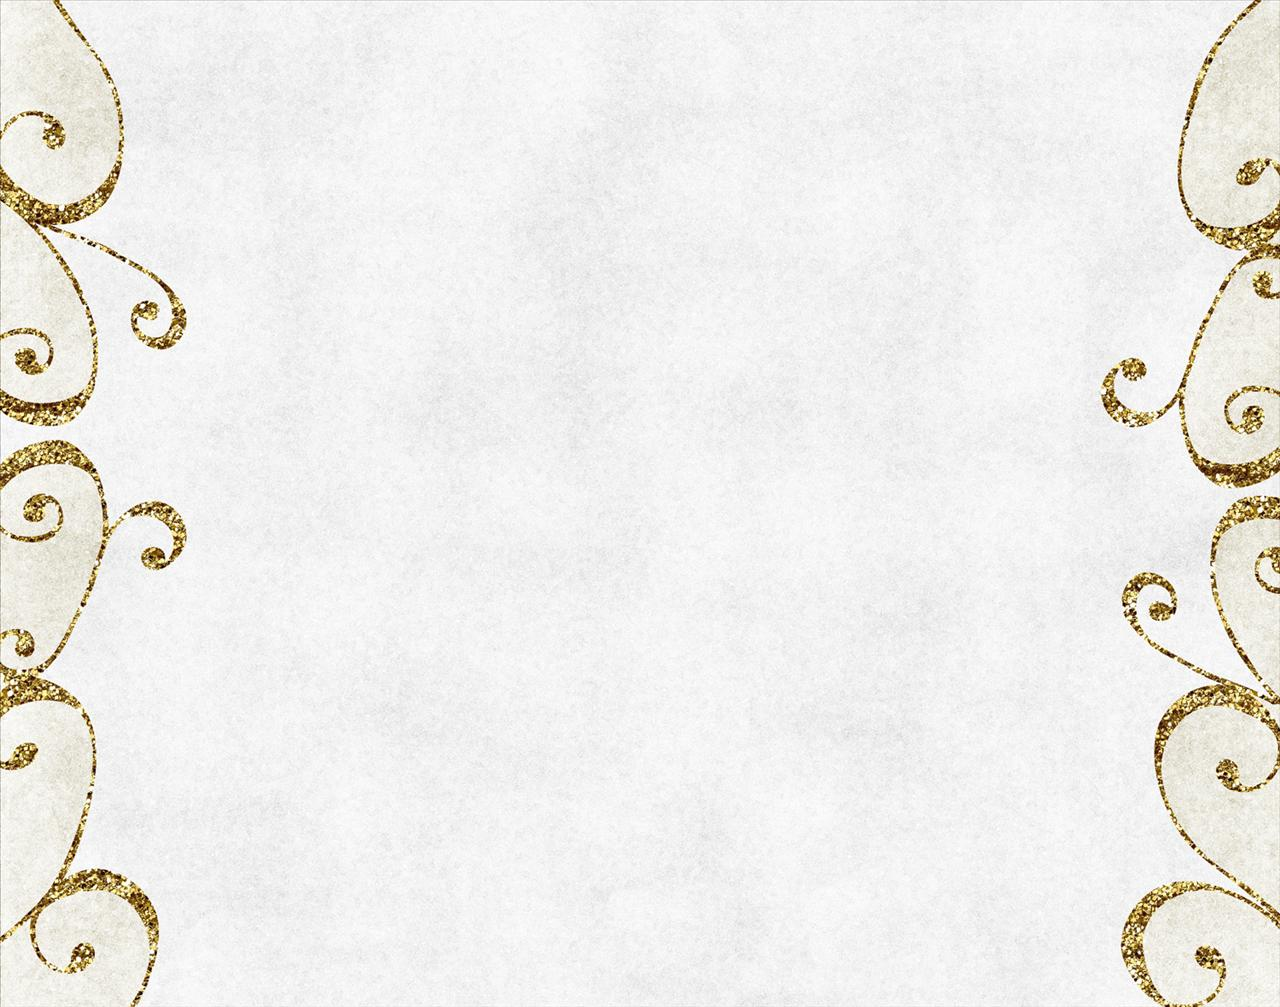 fancy gold border clipart clipart suggest